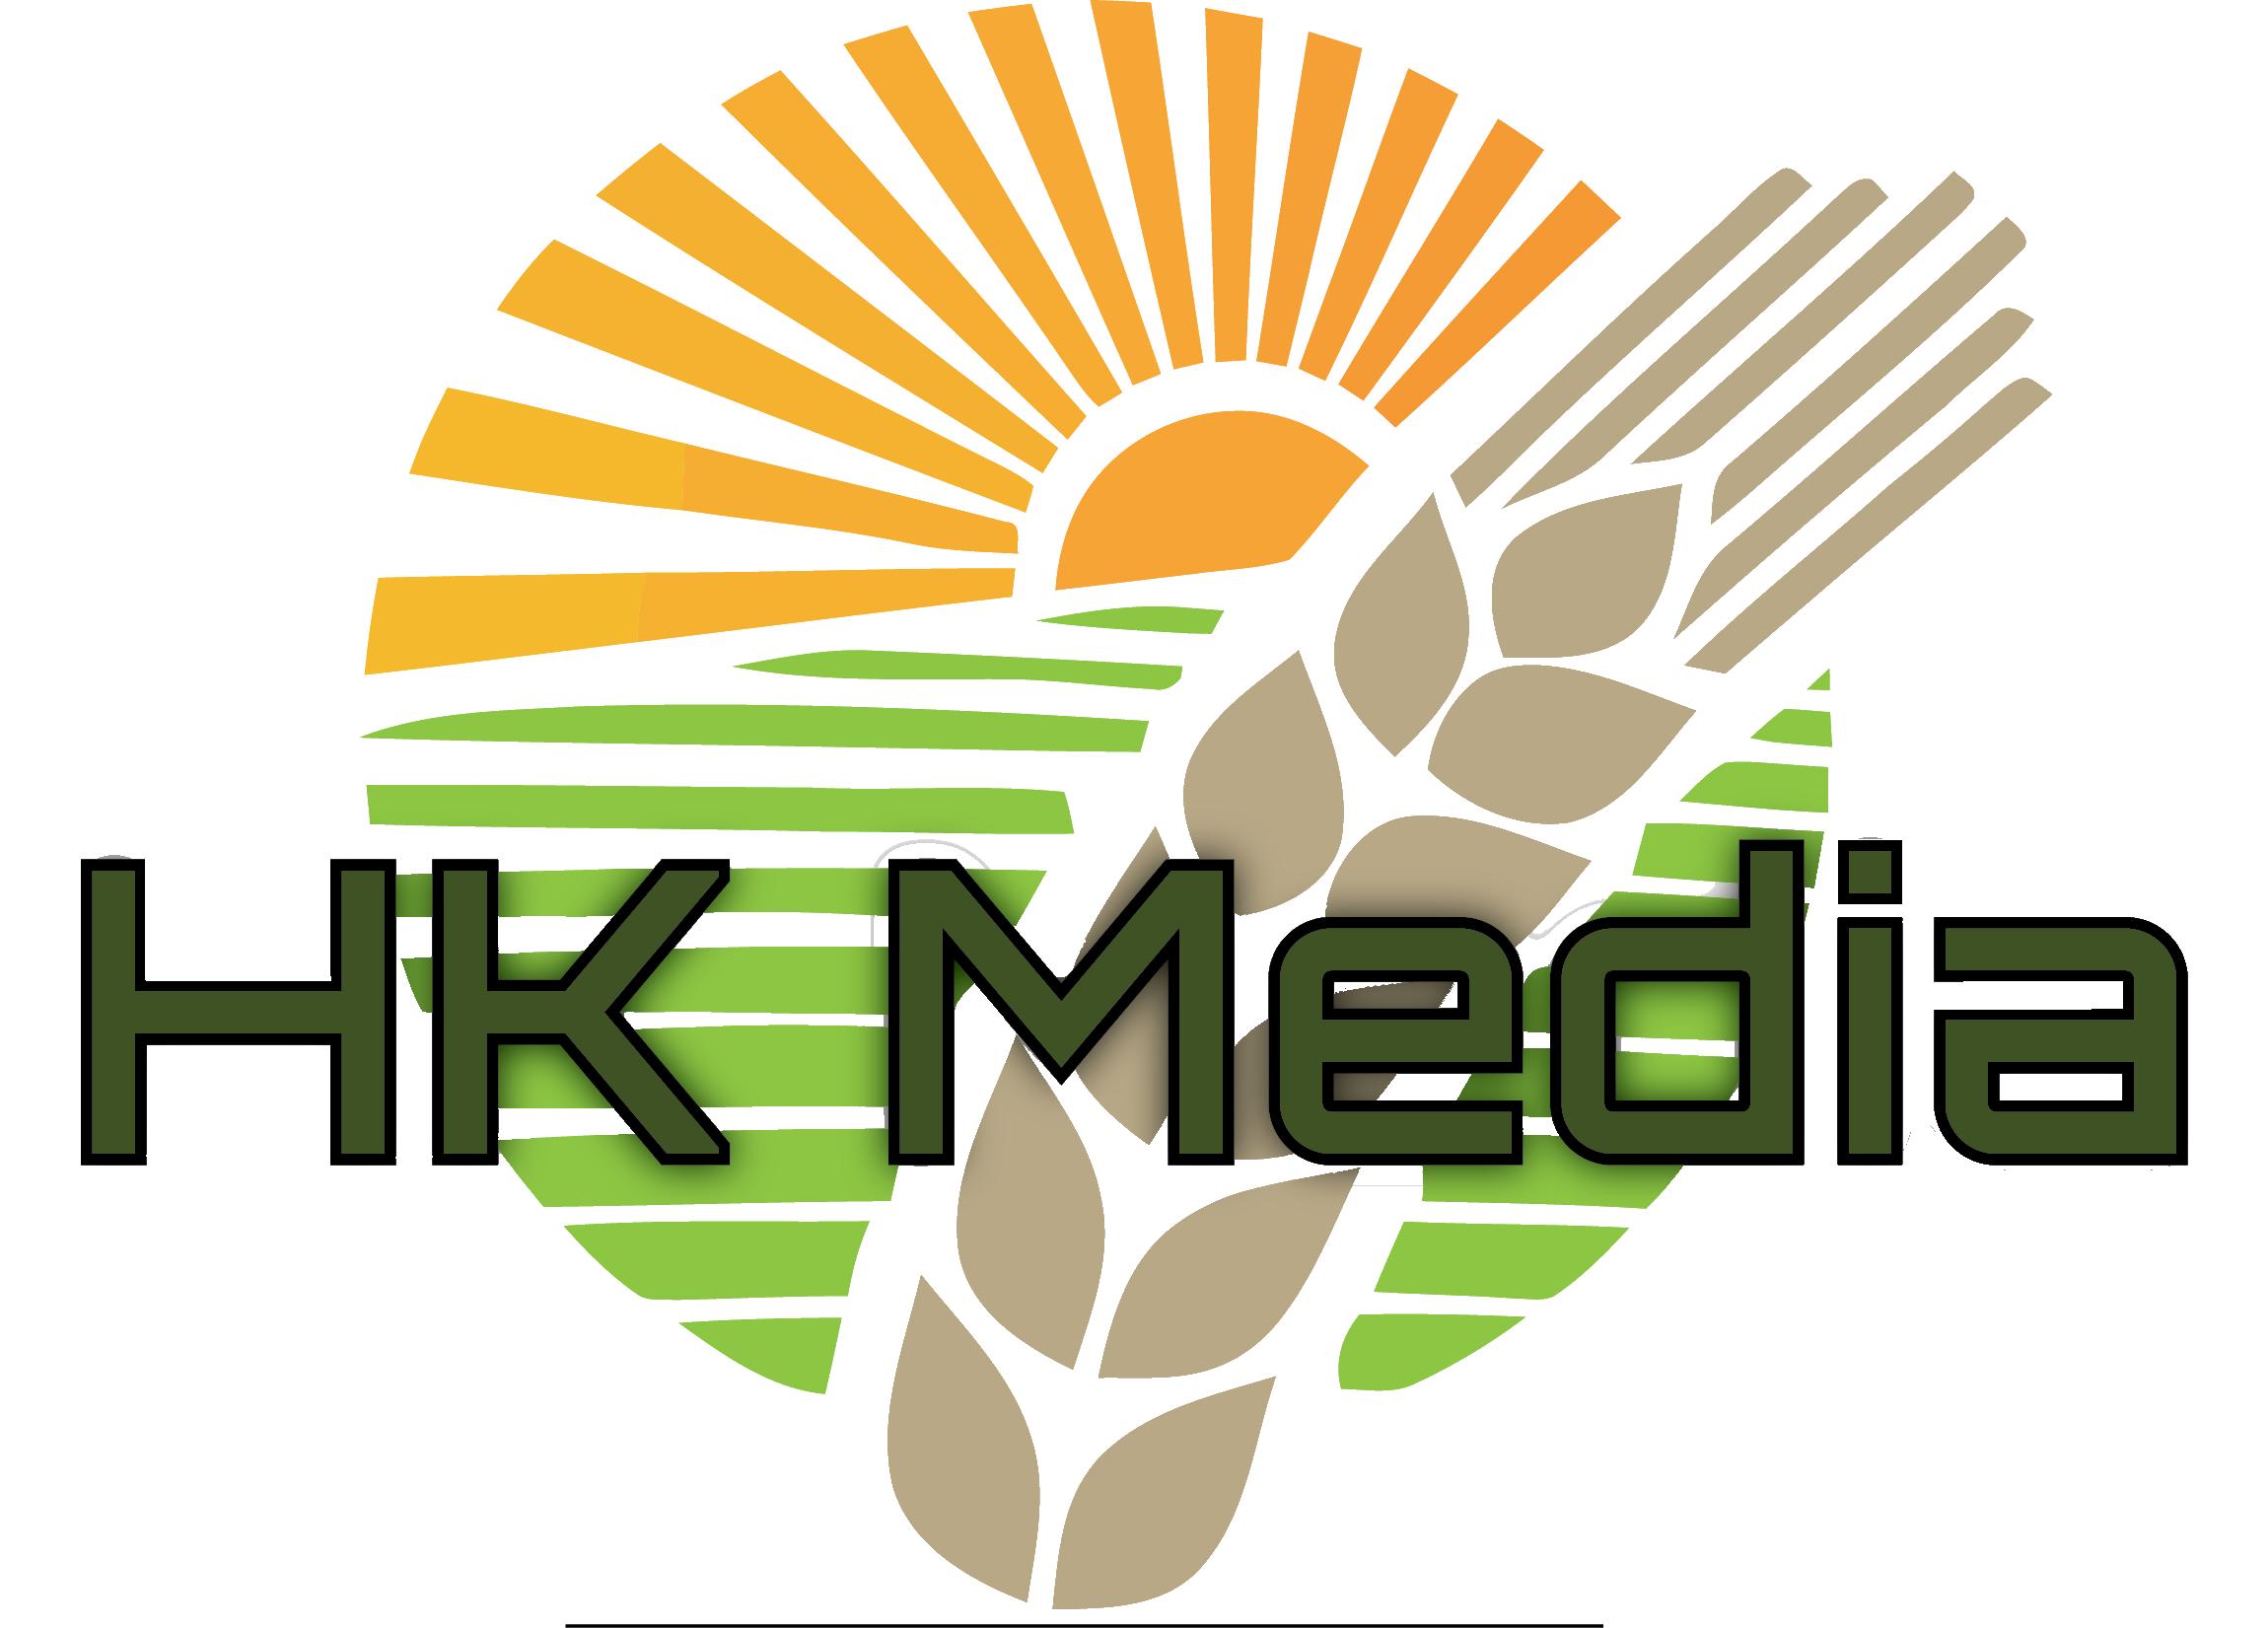 HK-Media Loggan Vi Har Samarbete